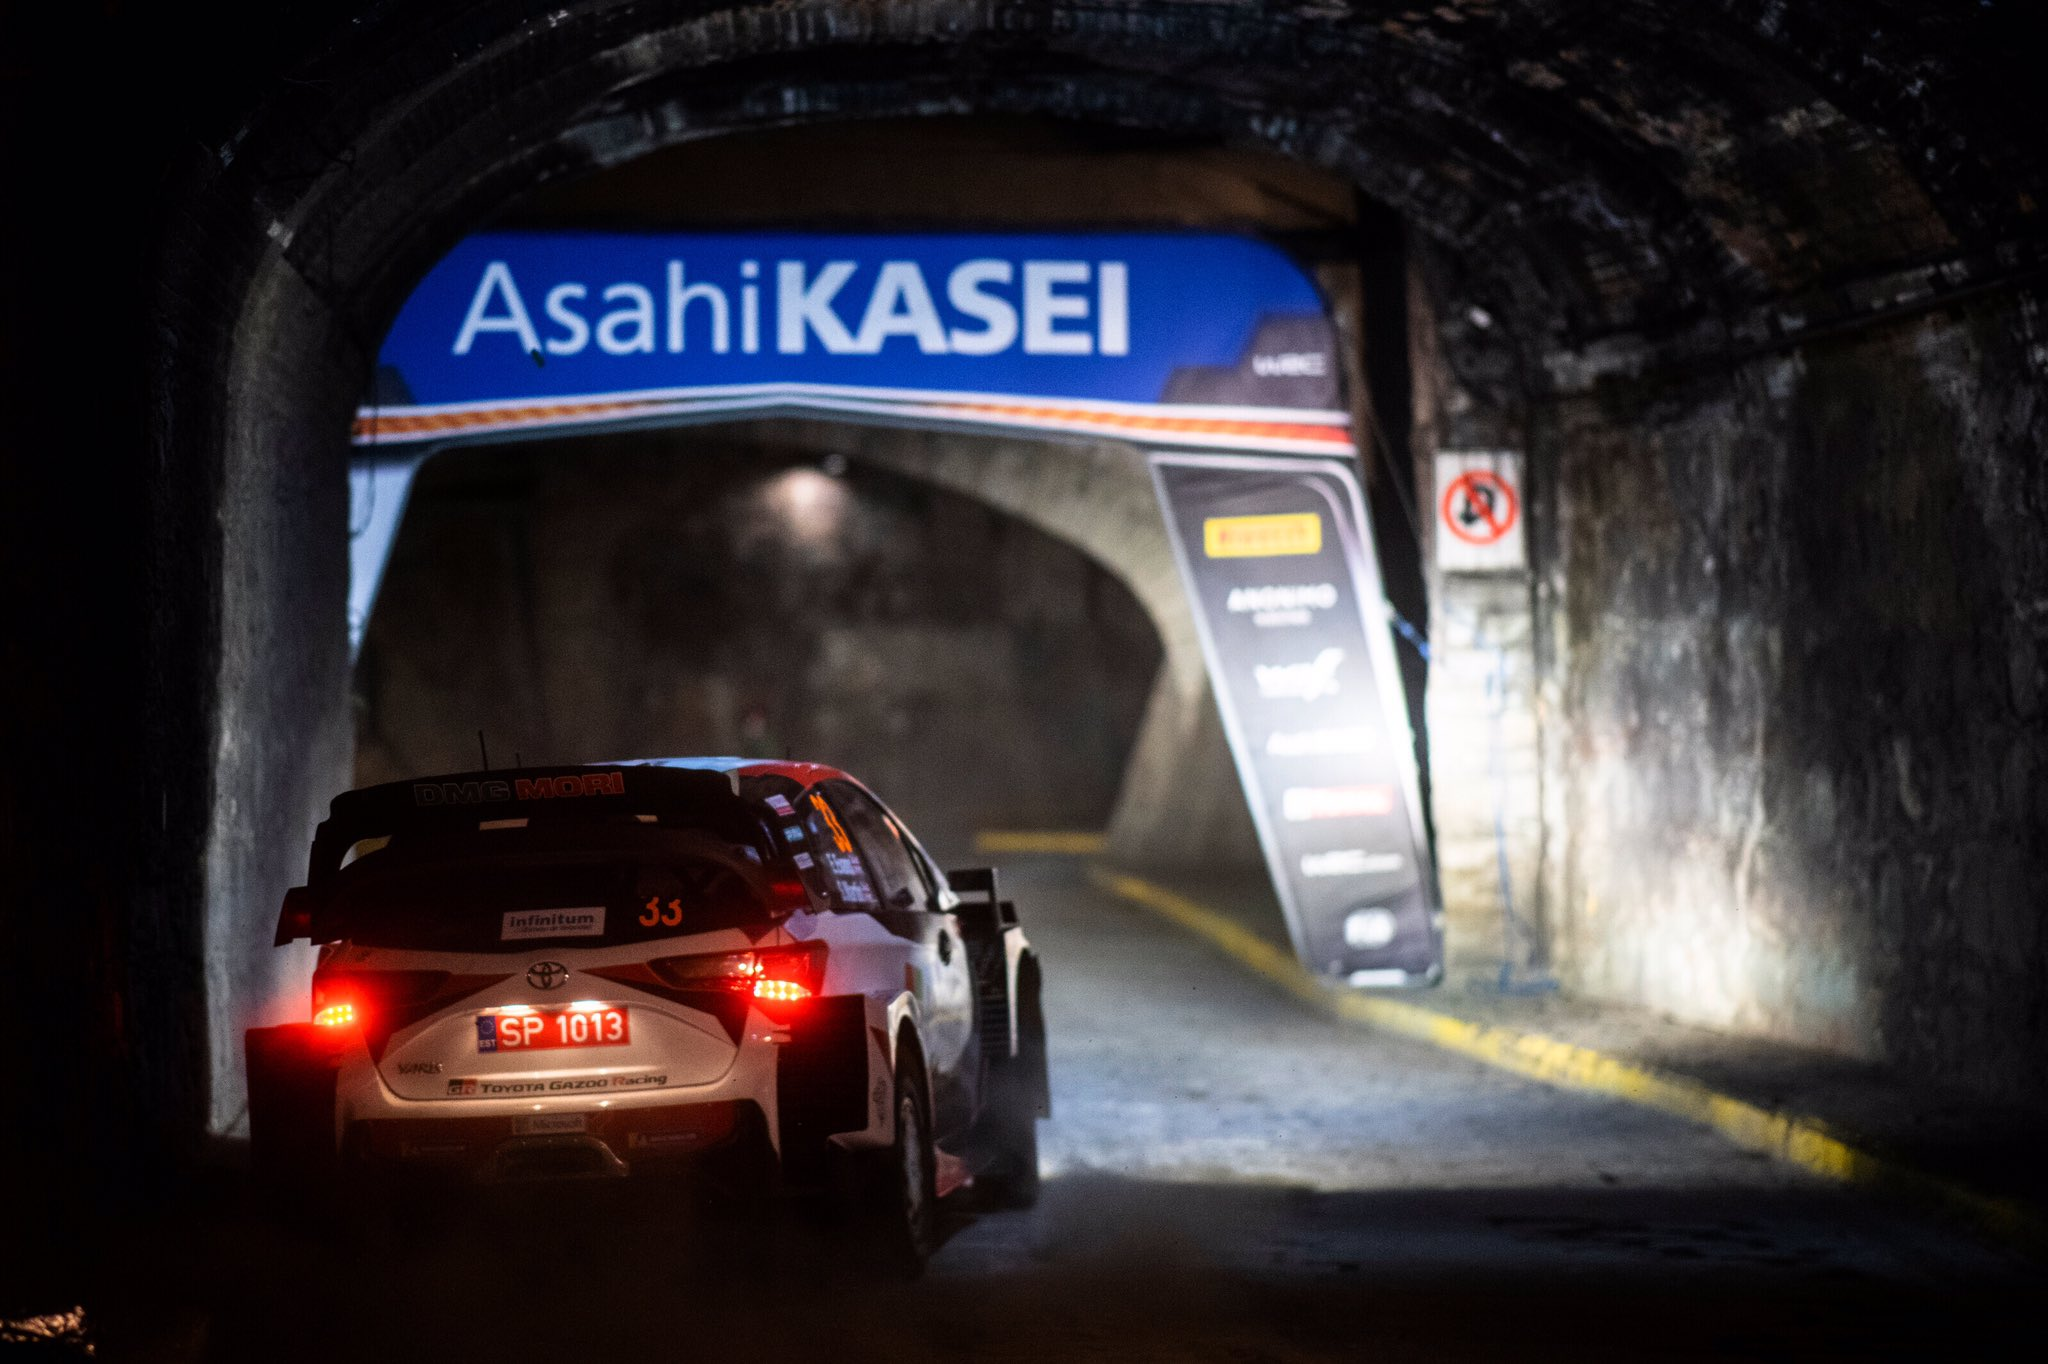 WRC: 17º Rallye Guanajuato Corona - México [12-15 Marzo] - Página 2 ES-HpoxXsAAVA8k?format=jpg&name=large